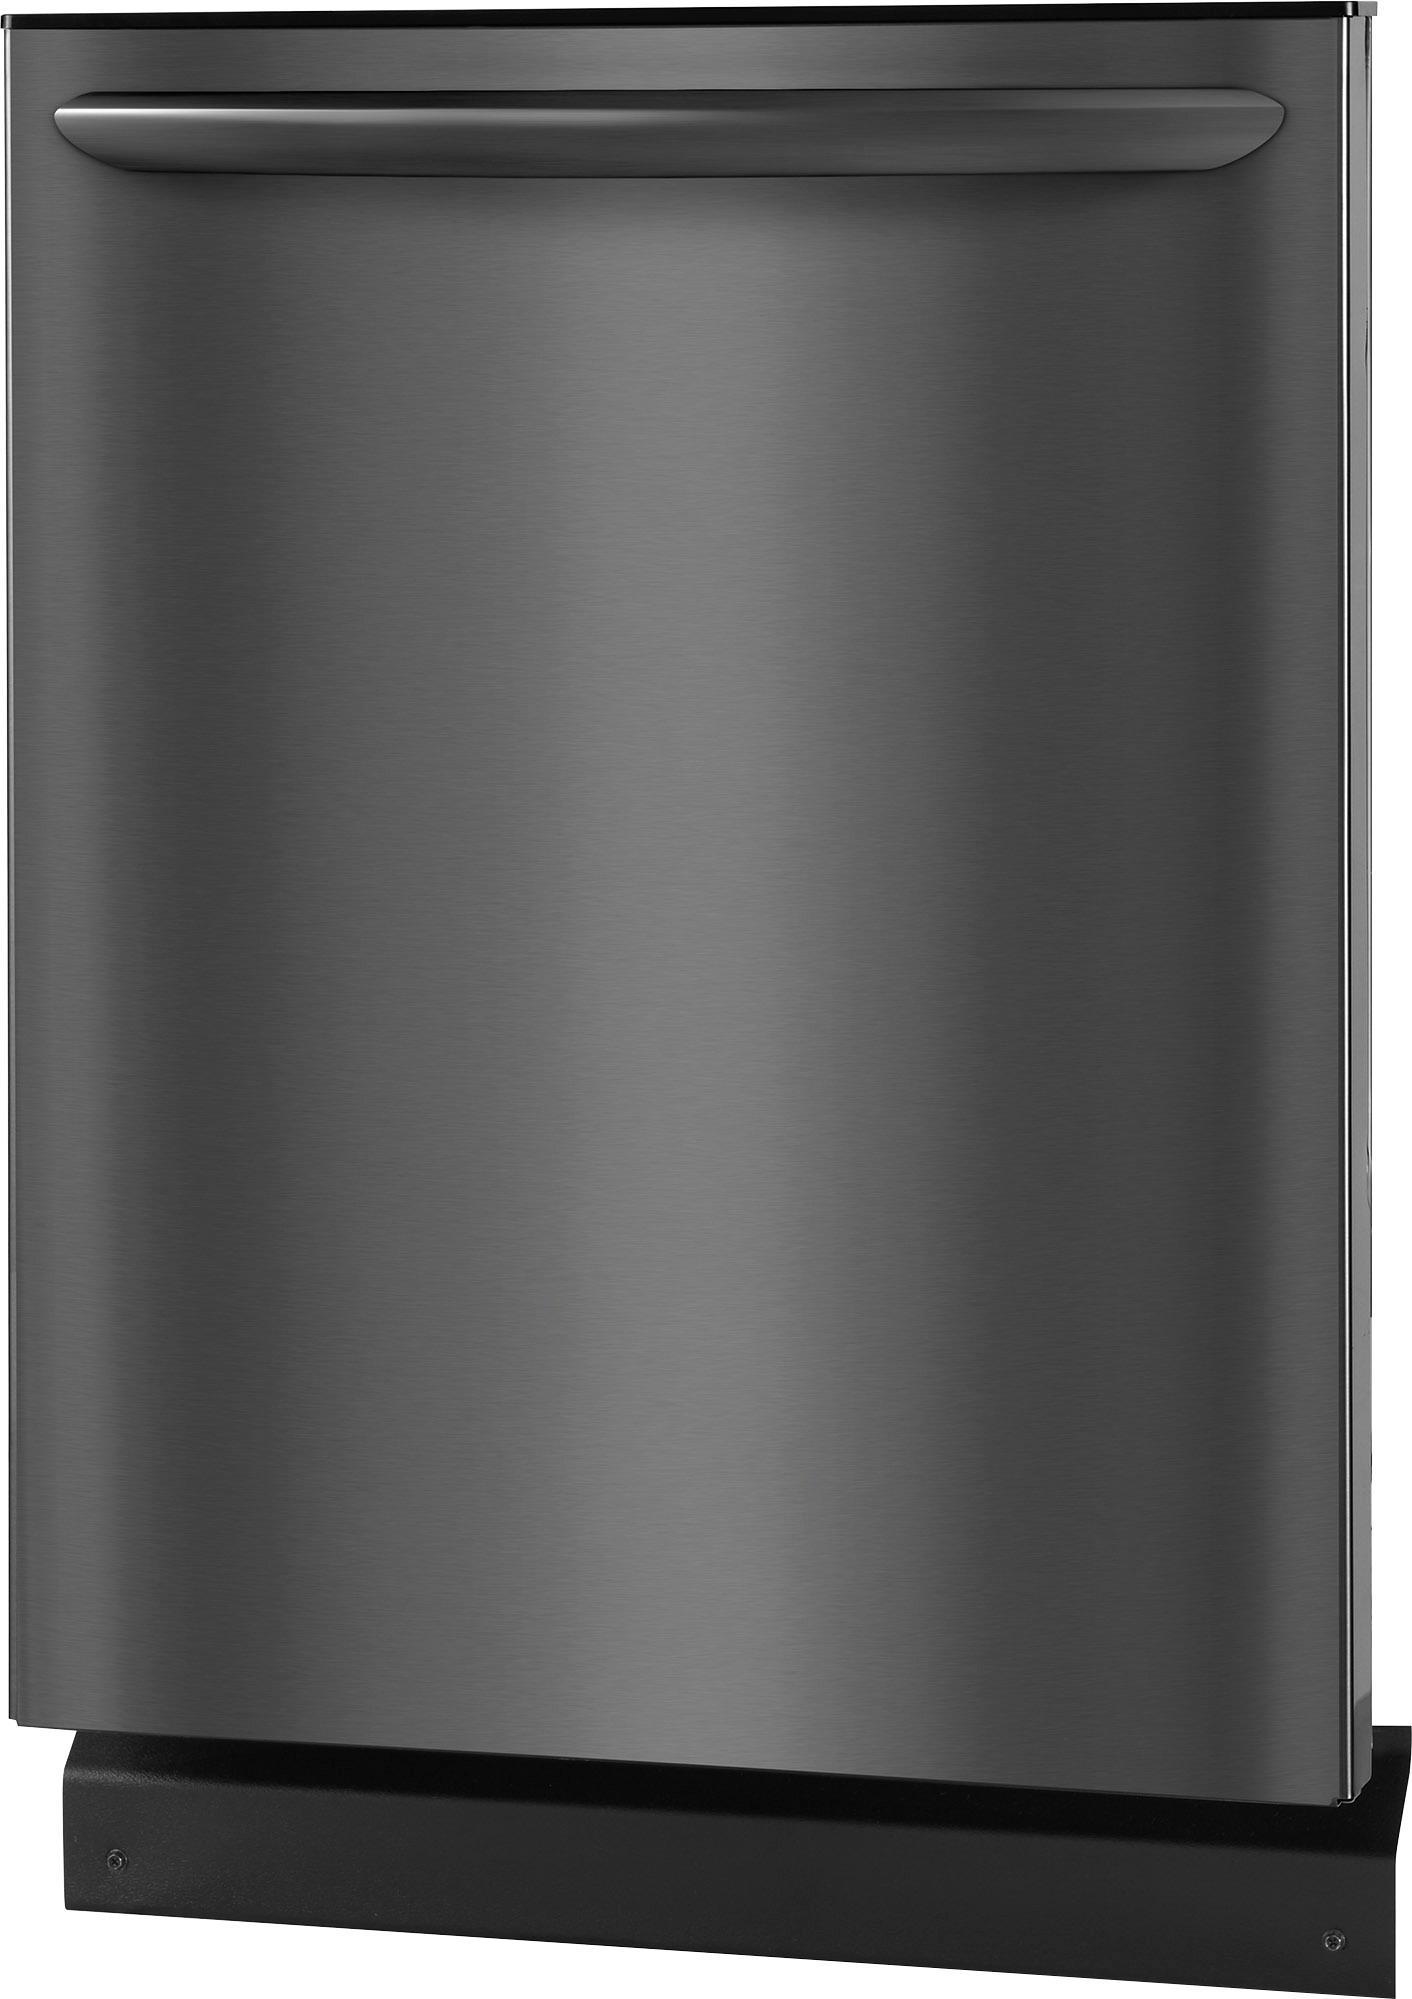 "Frigidaire FGID2466QD Gallery 24"" Built-In Dishwasher Black stainless steel"